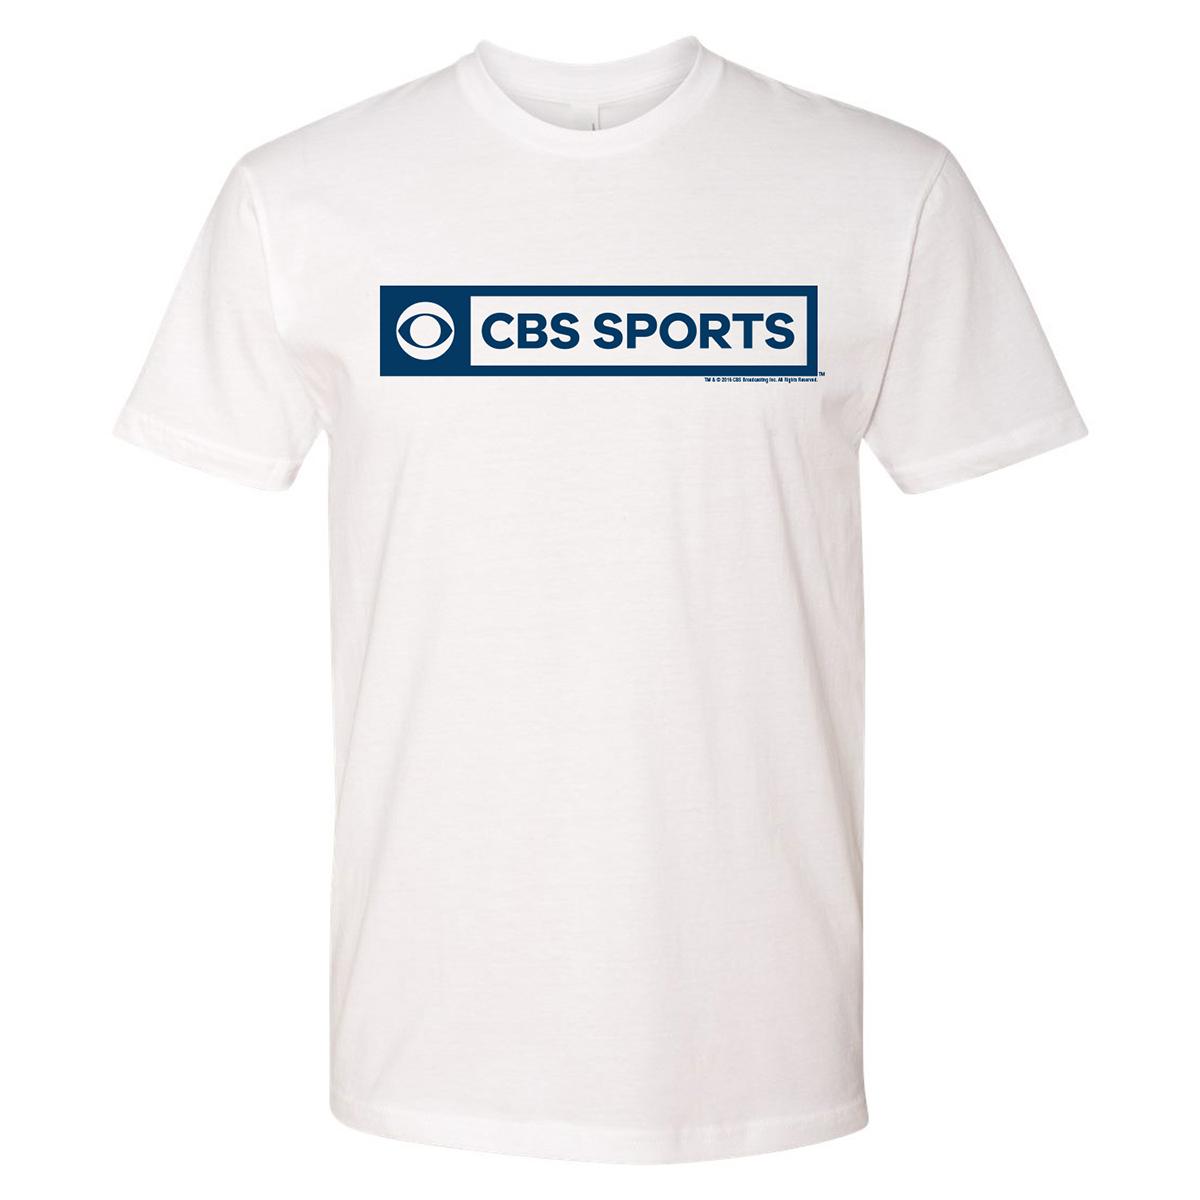 CBS Sports T-Shirt